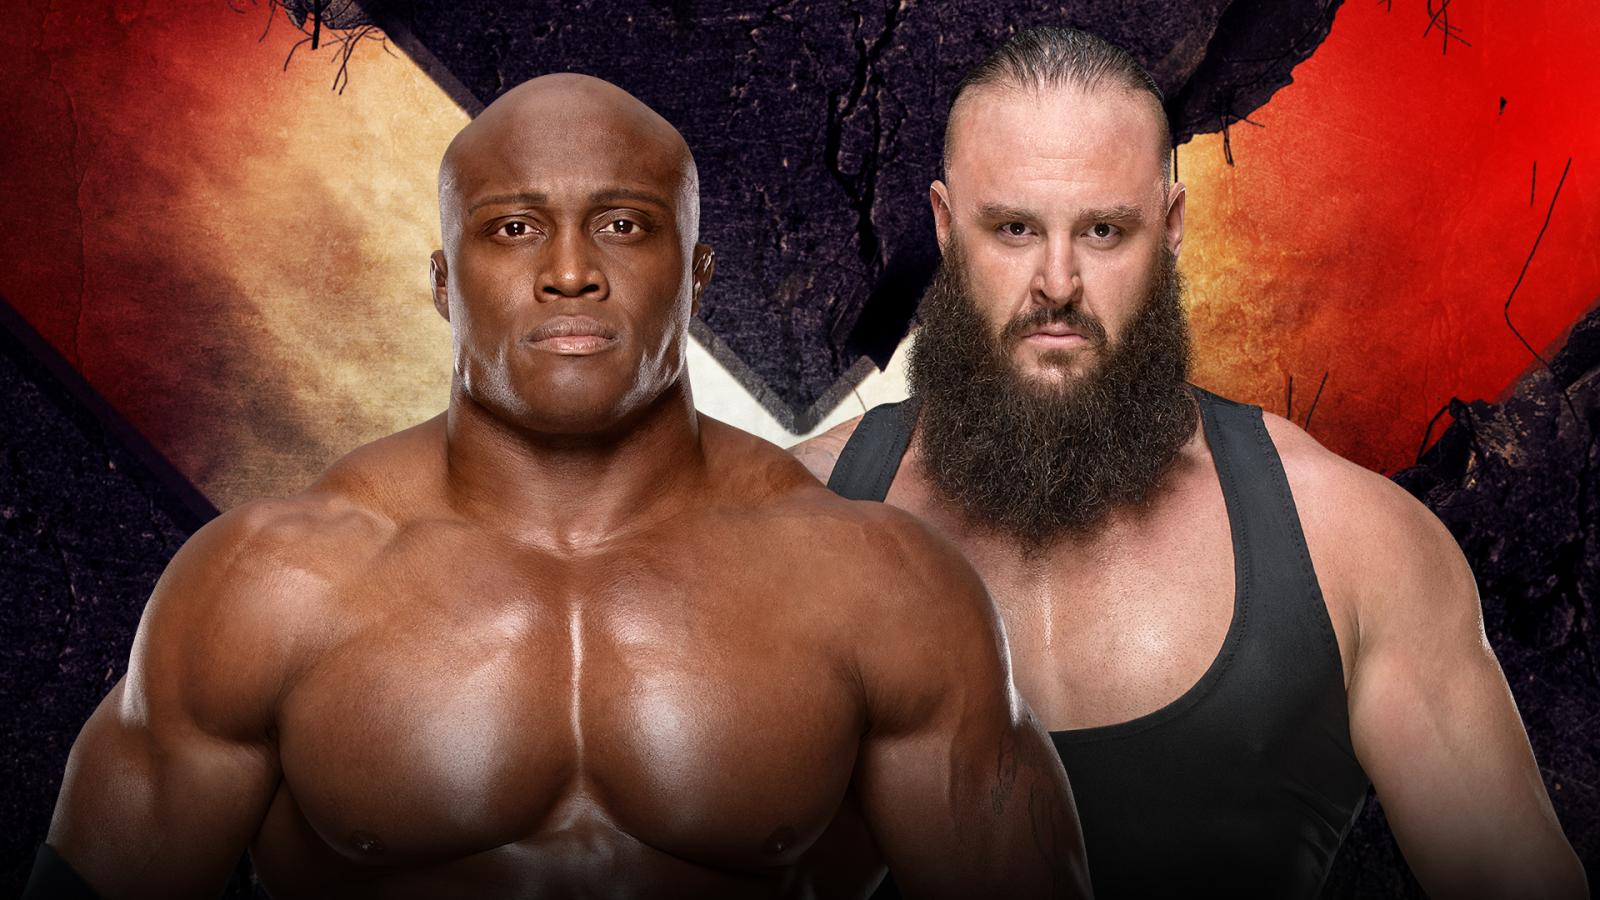 Braun Strowman And Bobby Lashley Wreak Havoc At WWE 'Extreme Rules'